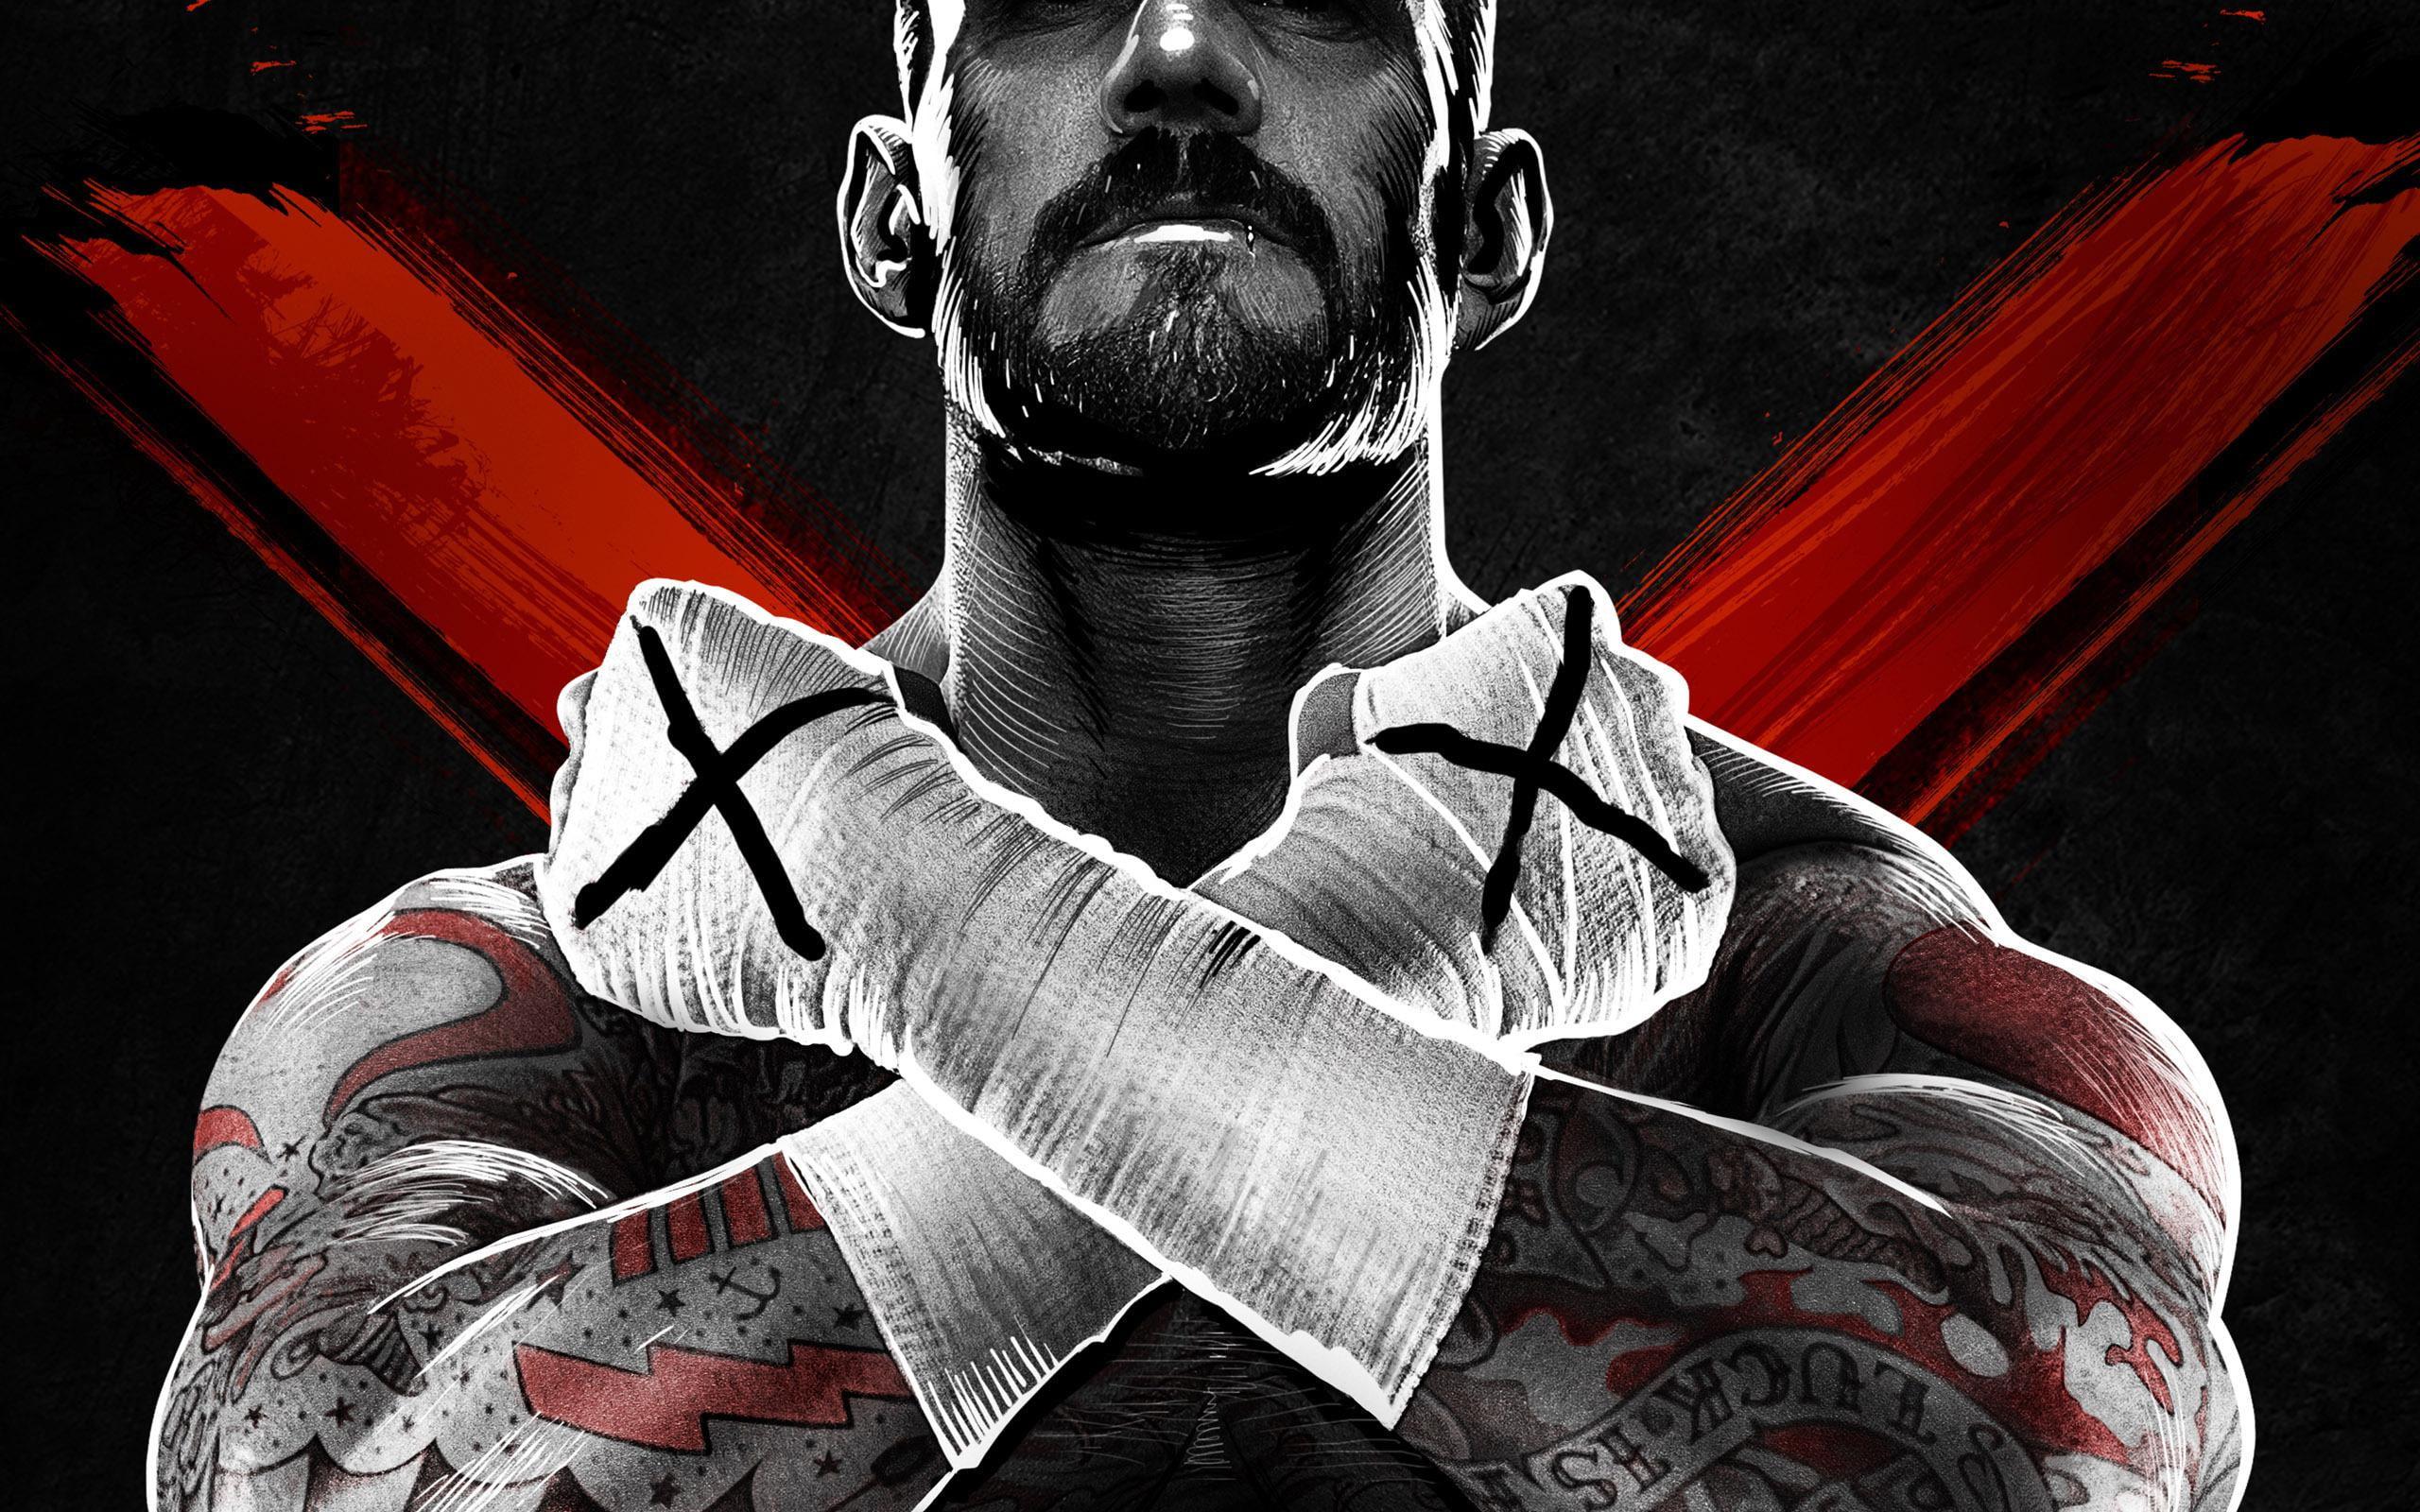 HD wallpaper WWE Goldberg goldberg photo Wallpaper Flare 2560x1600